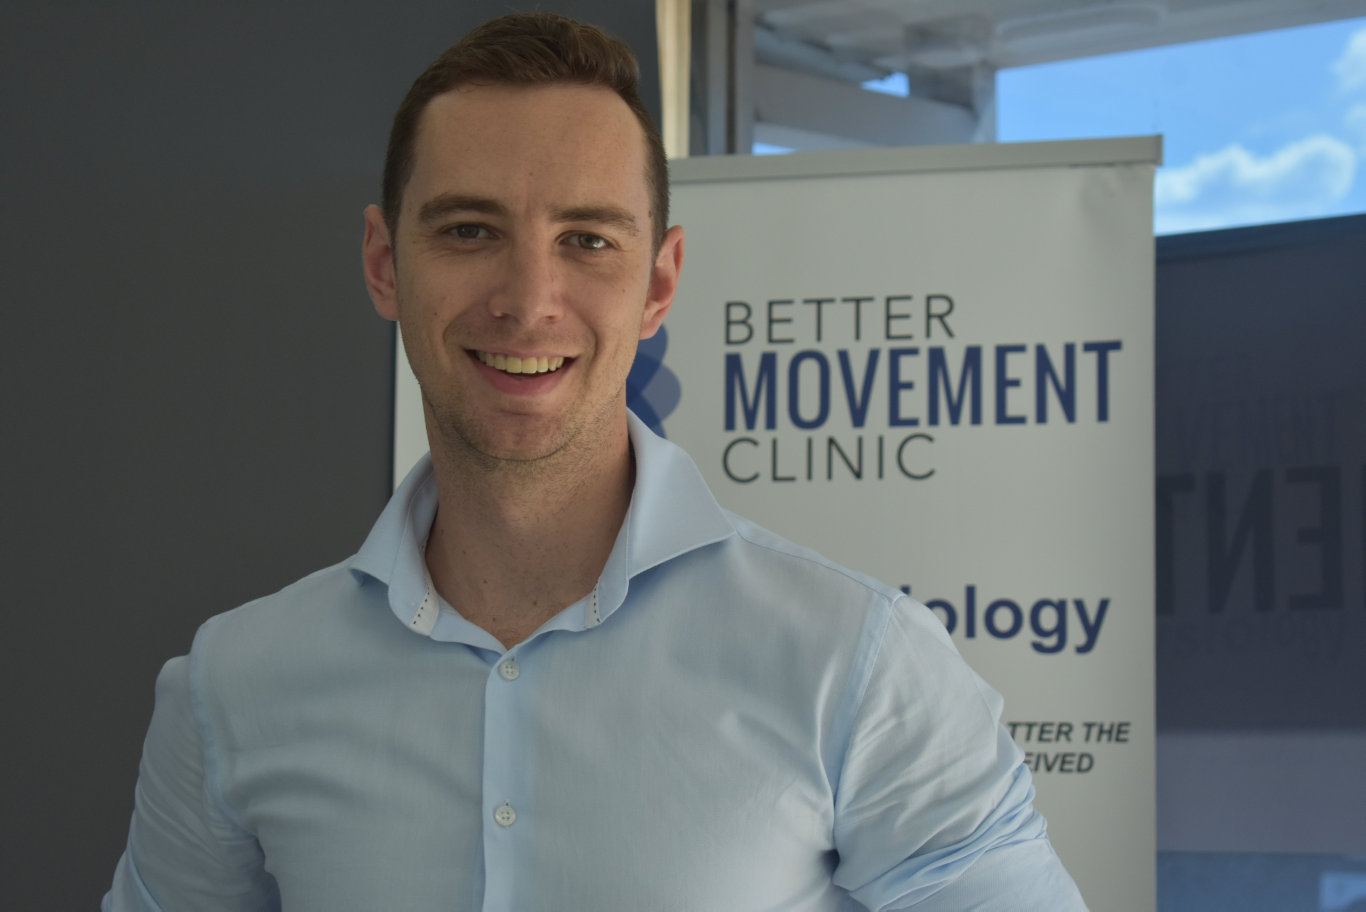 John Dennehy, Better Movement Clinic